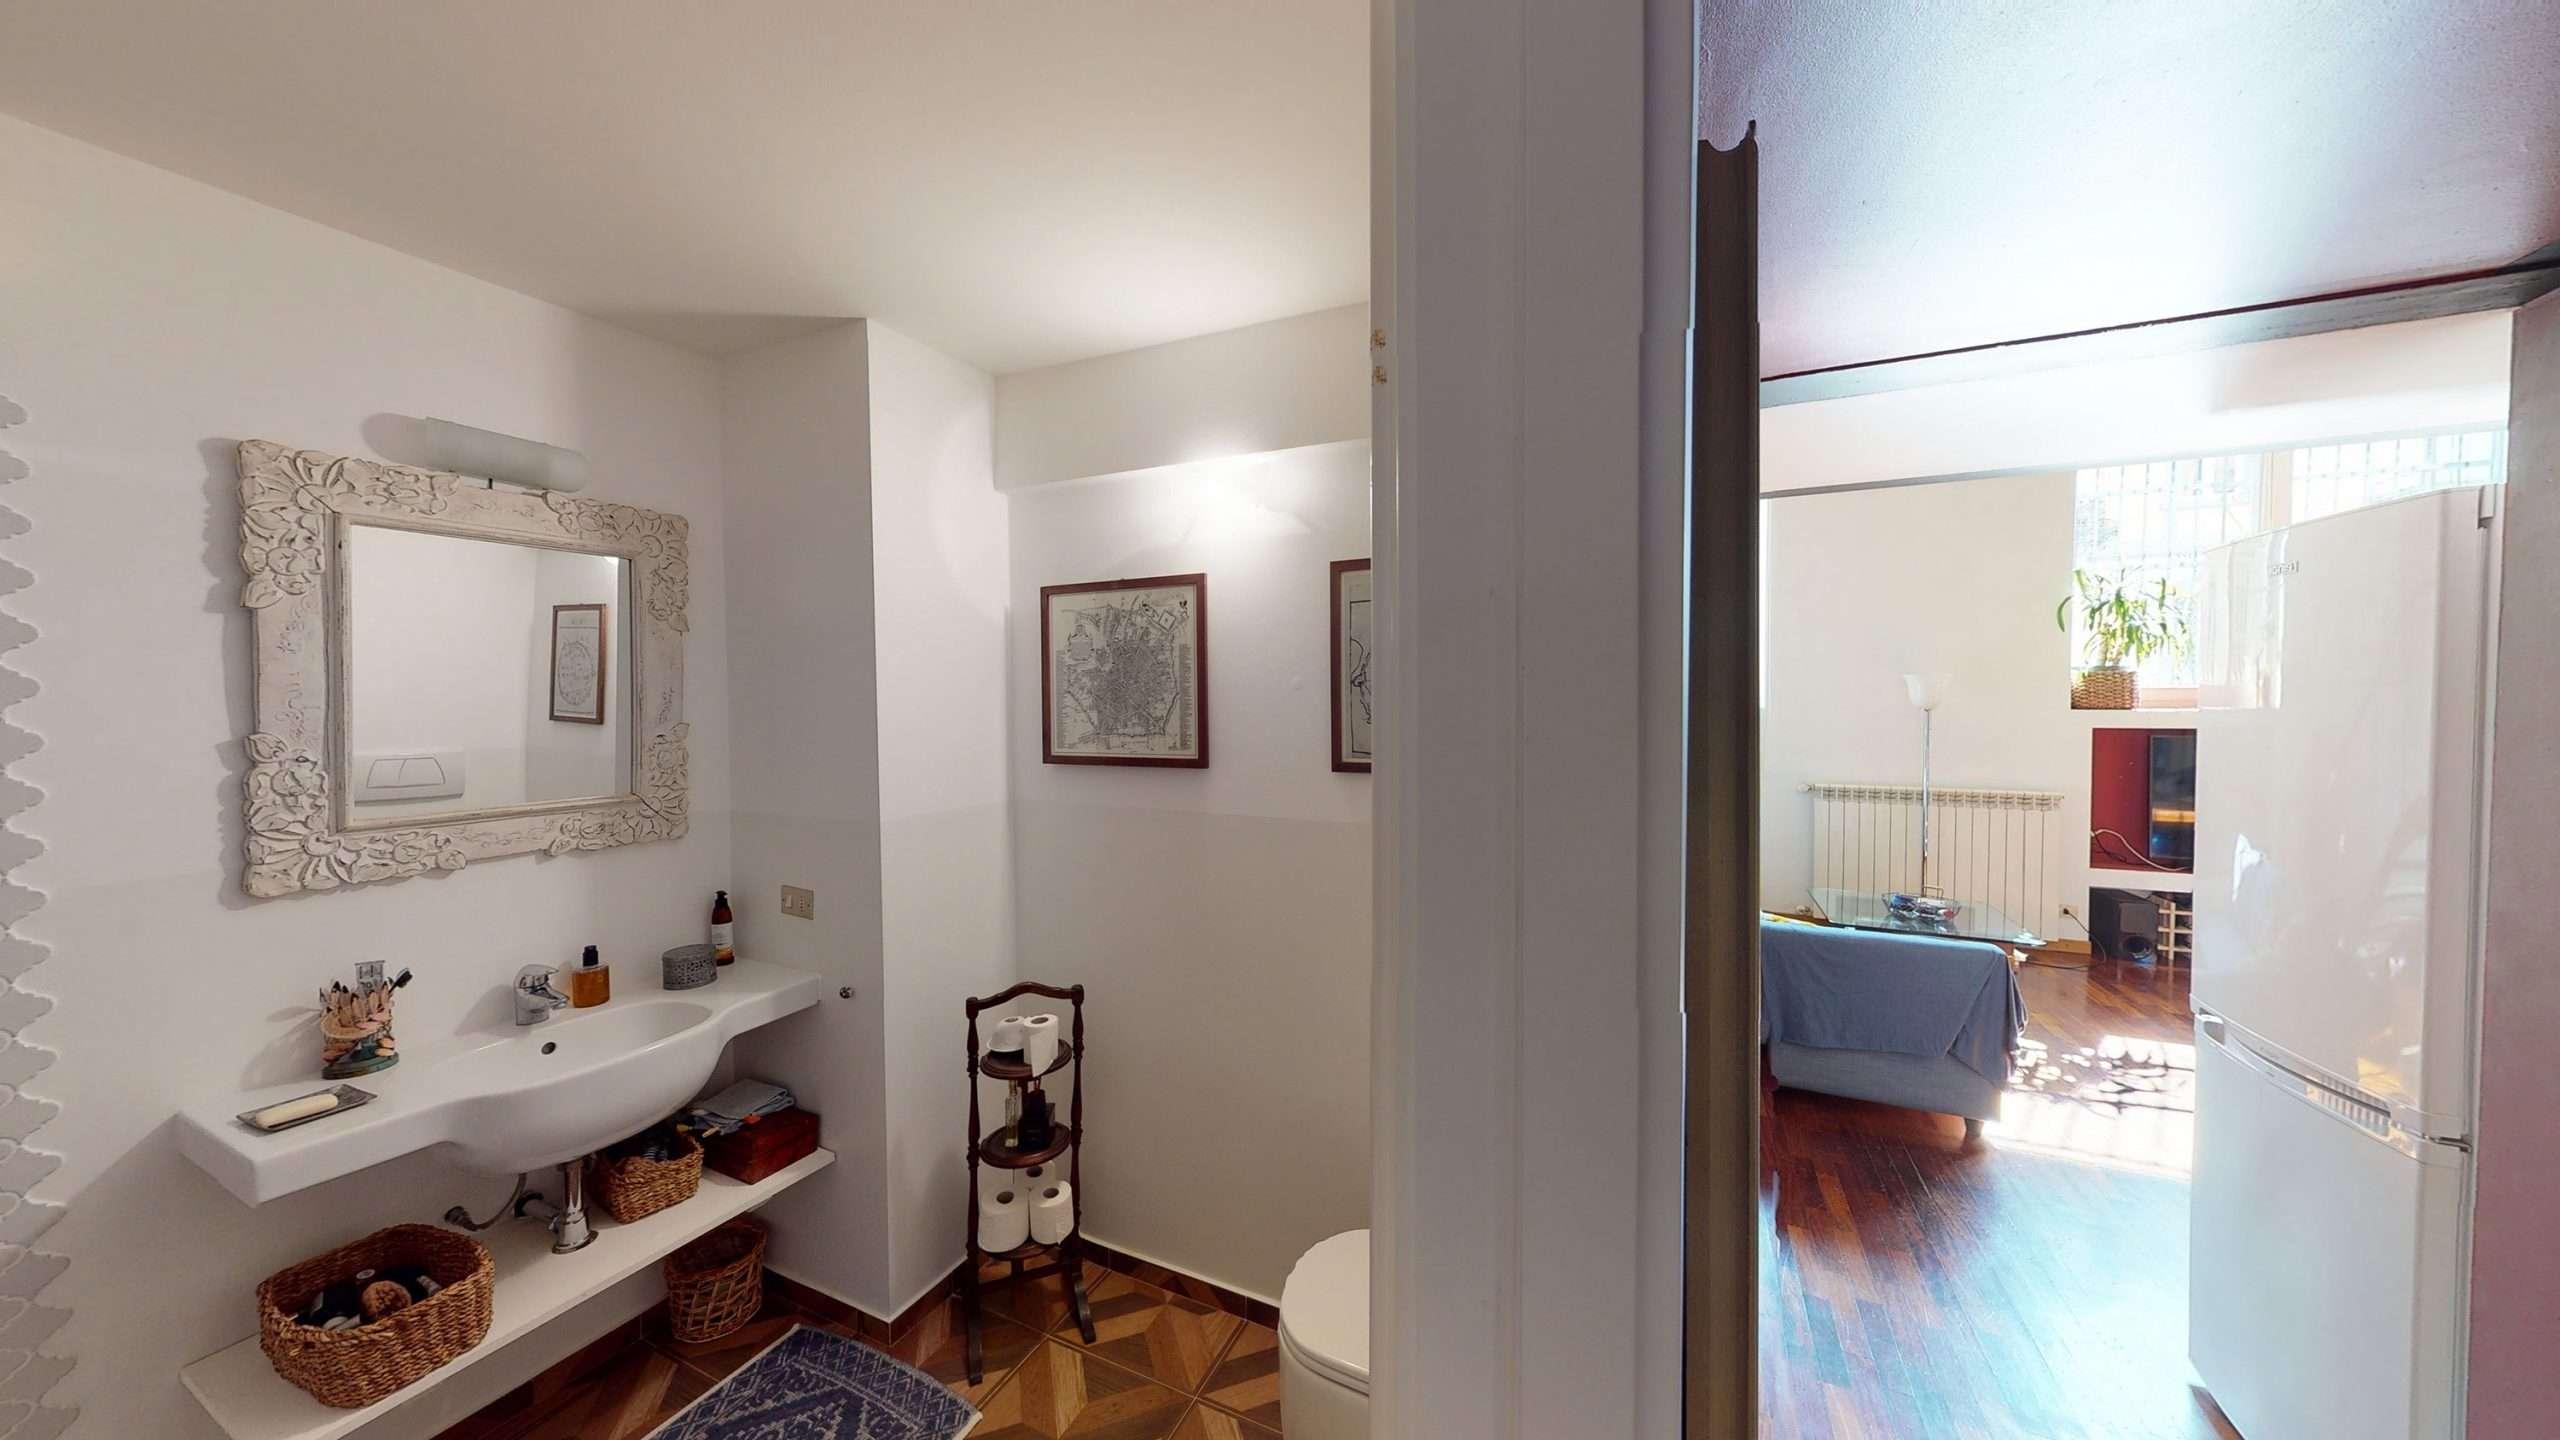 Via-Via-Settala-bathroom_2c